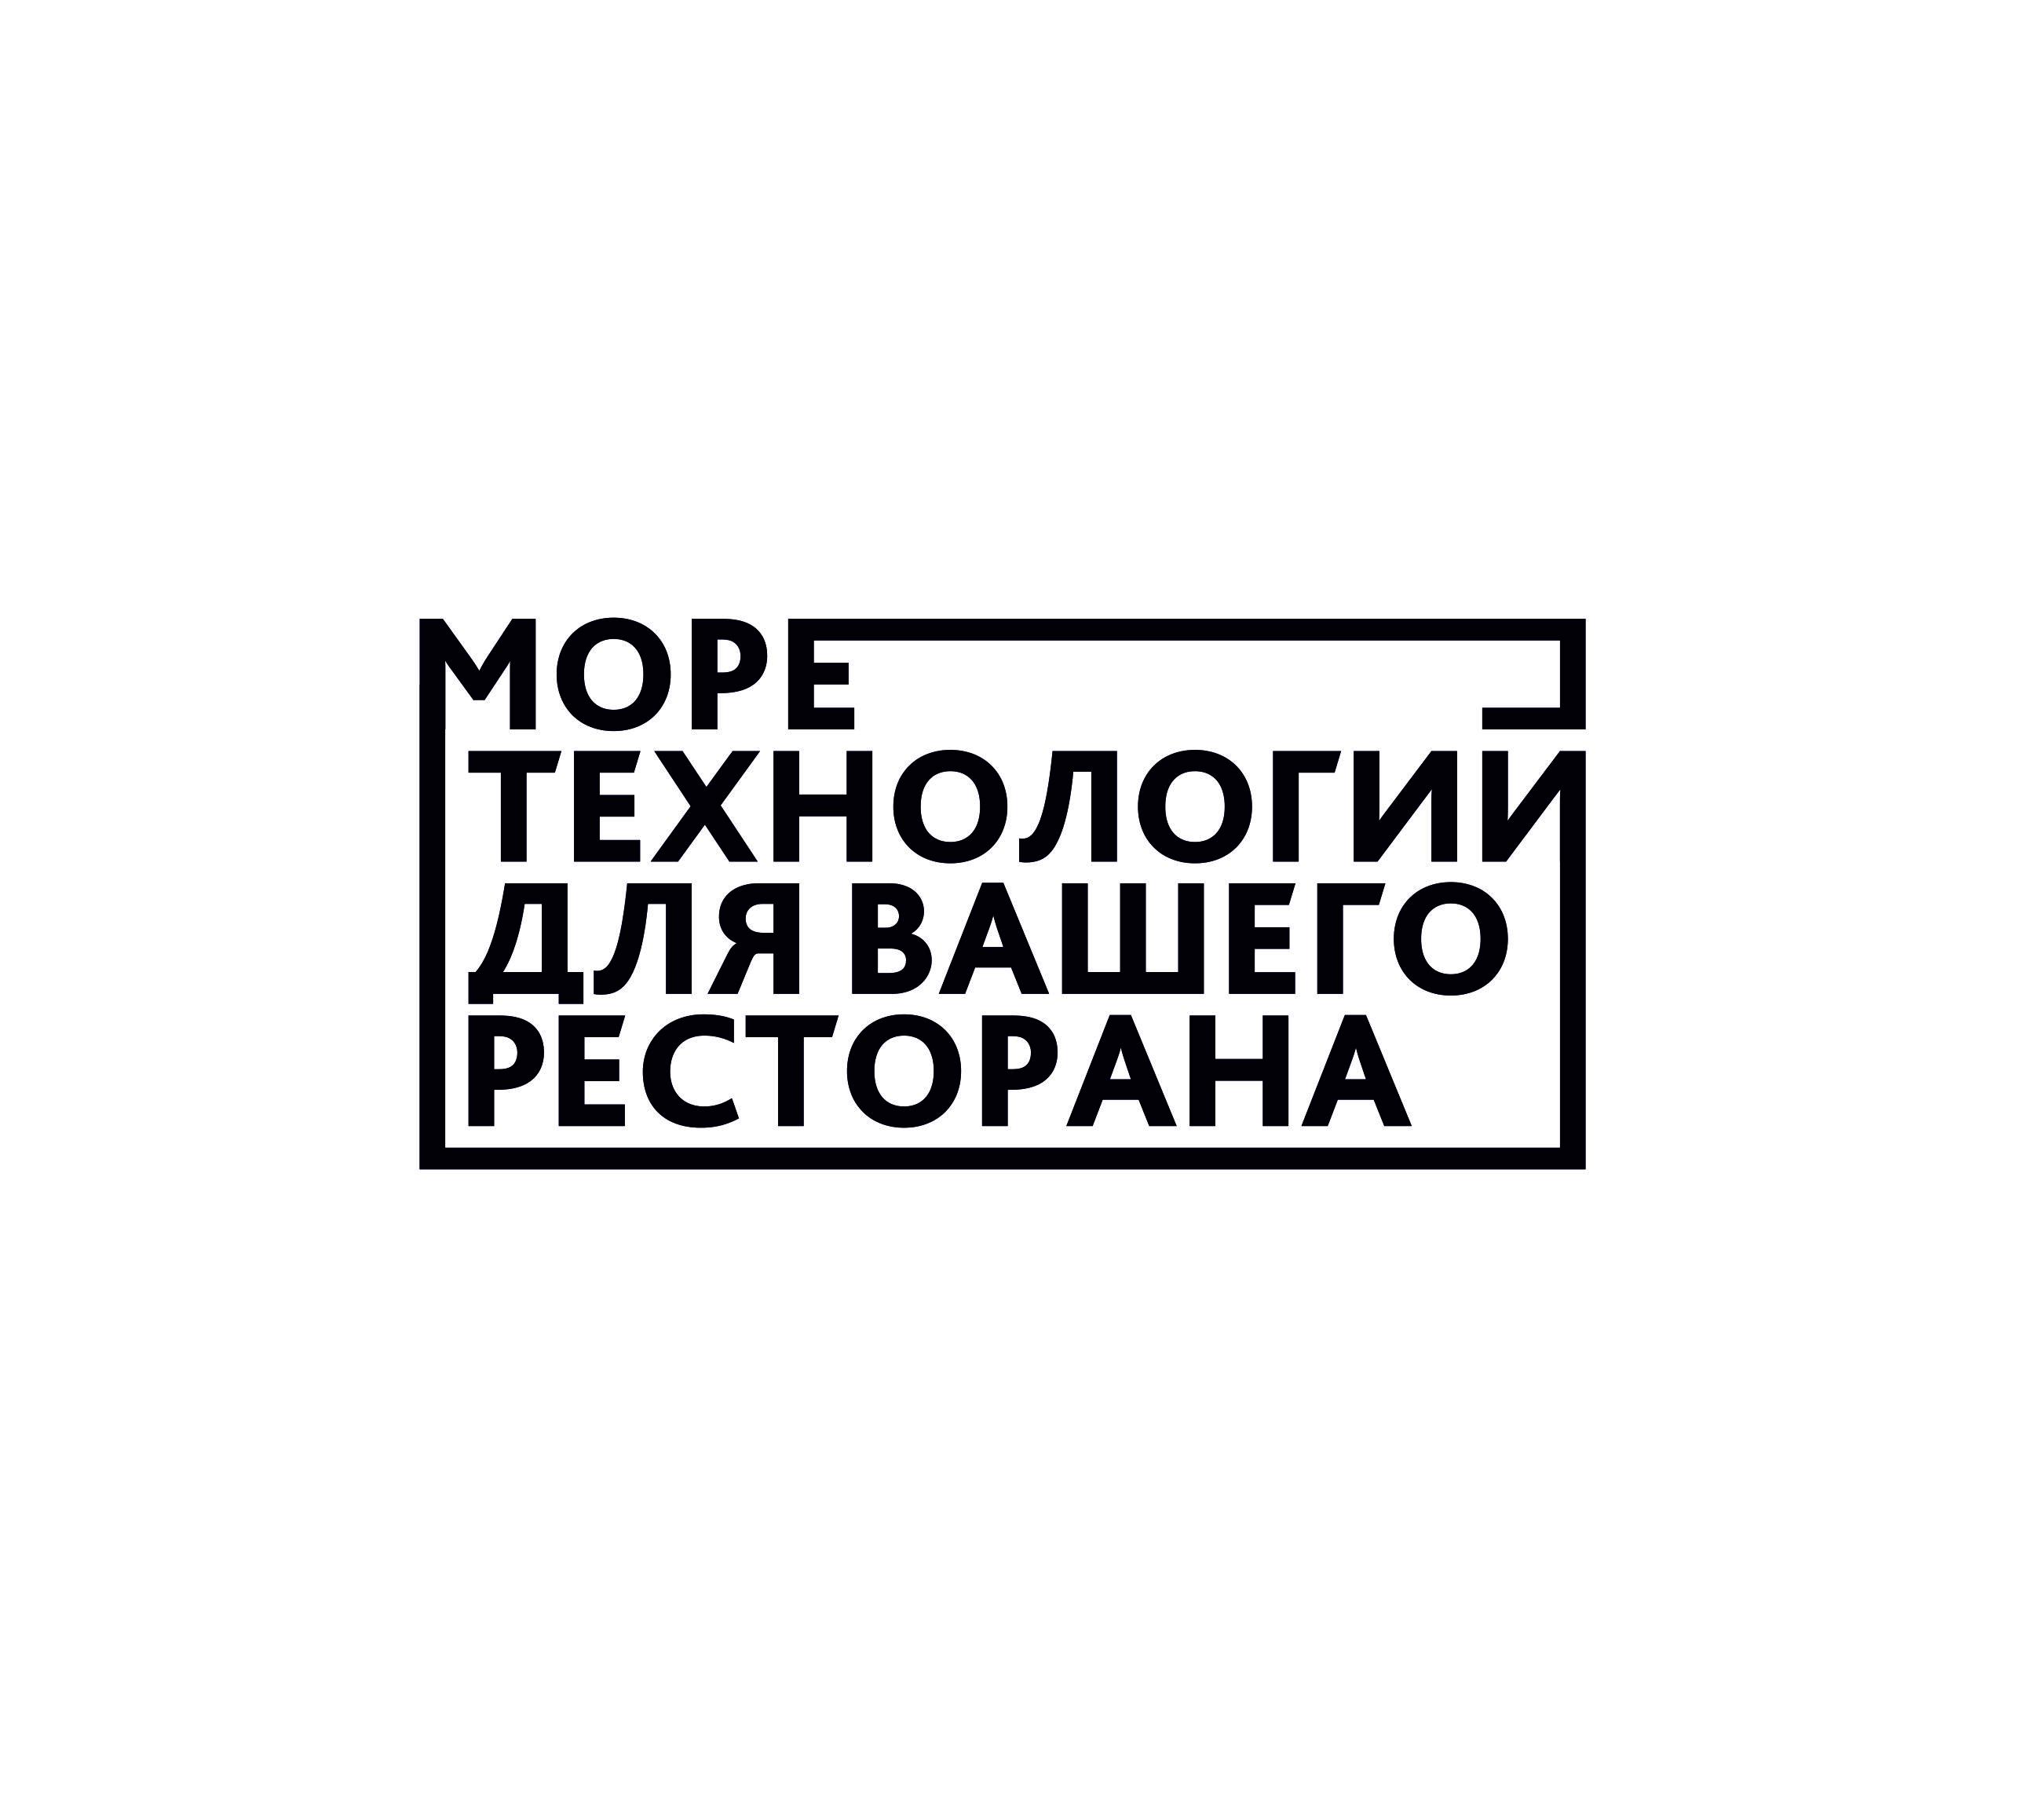 Логотип на заставку